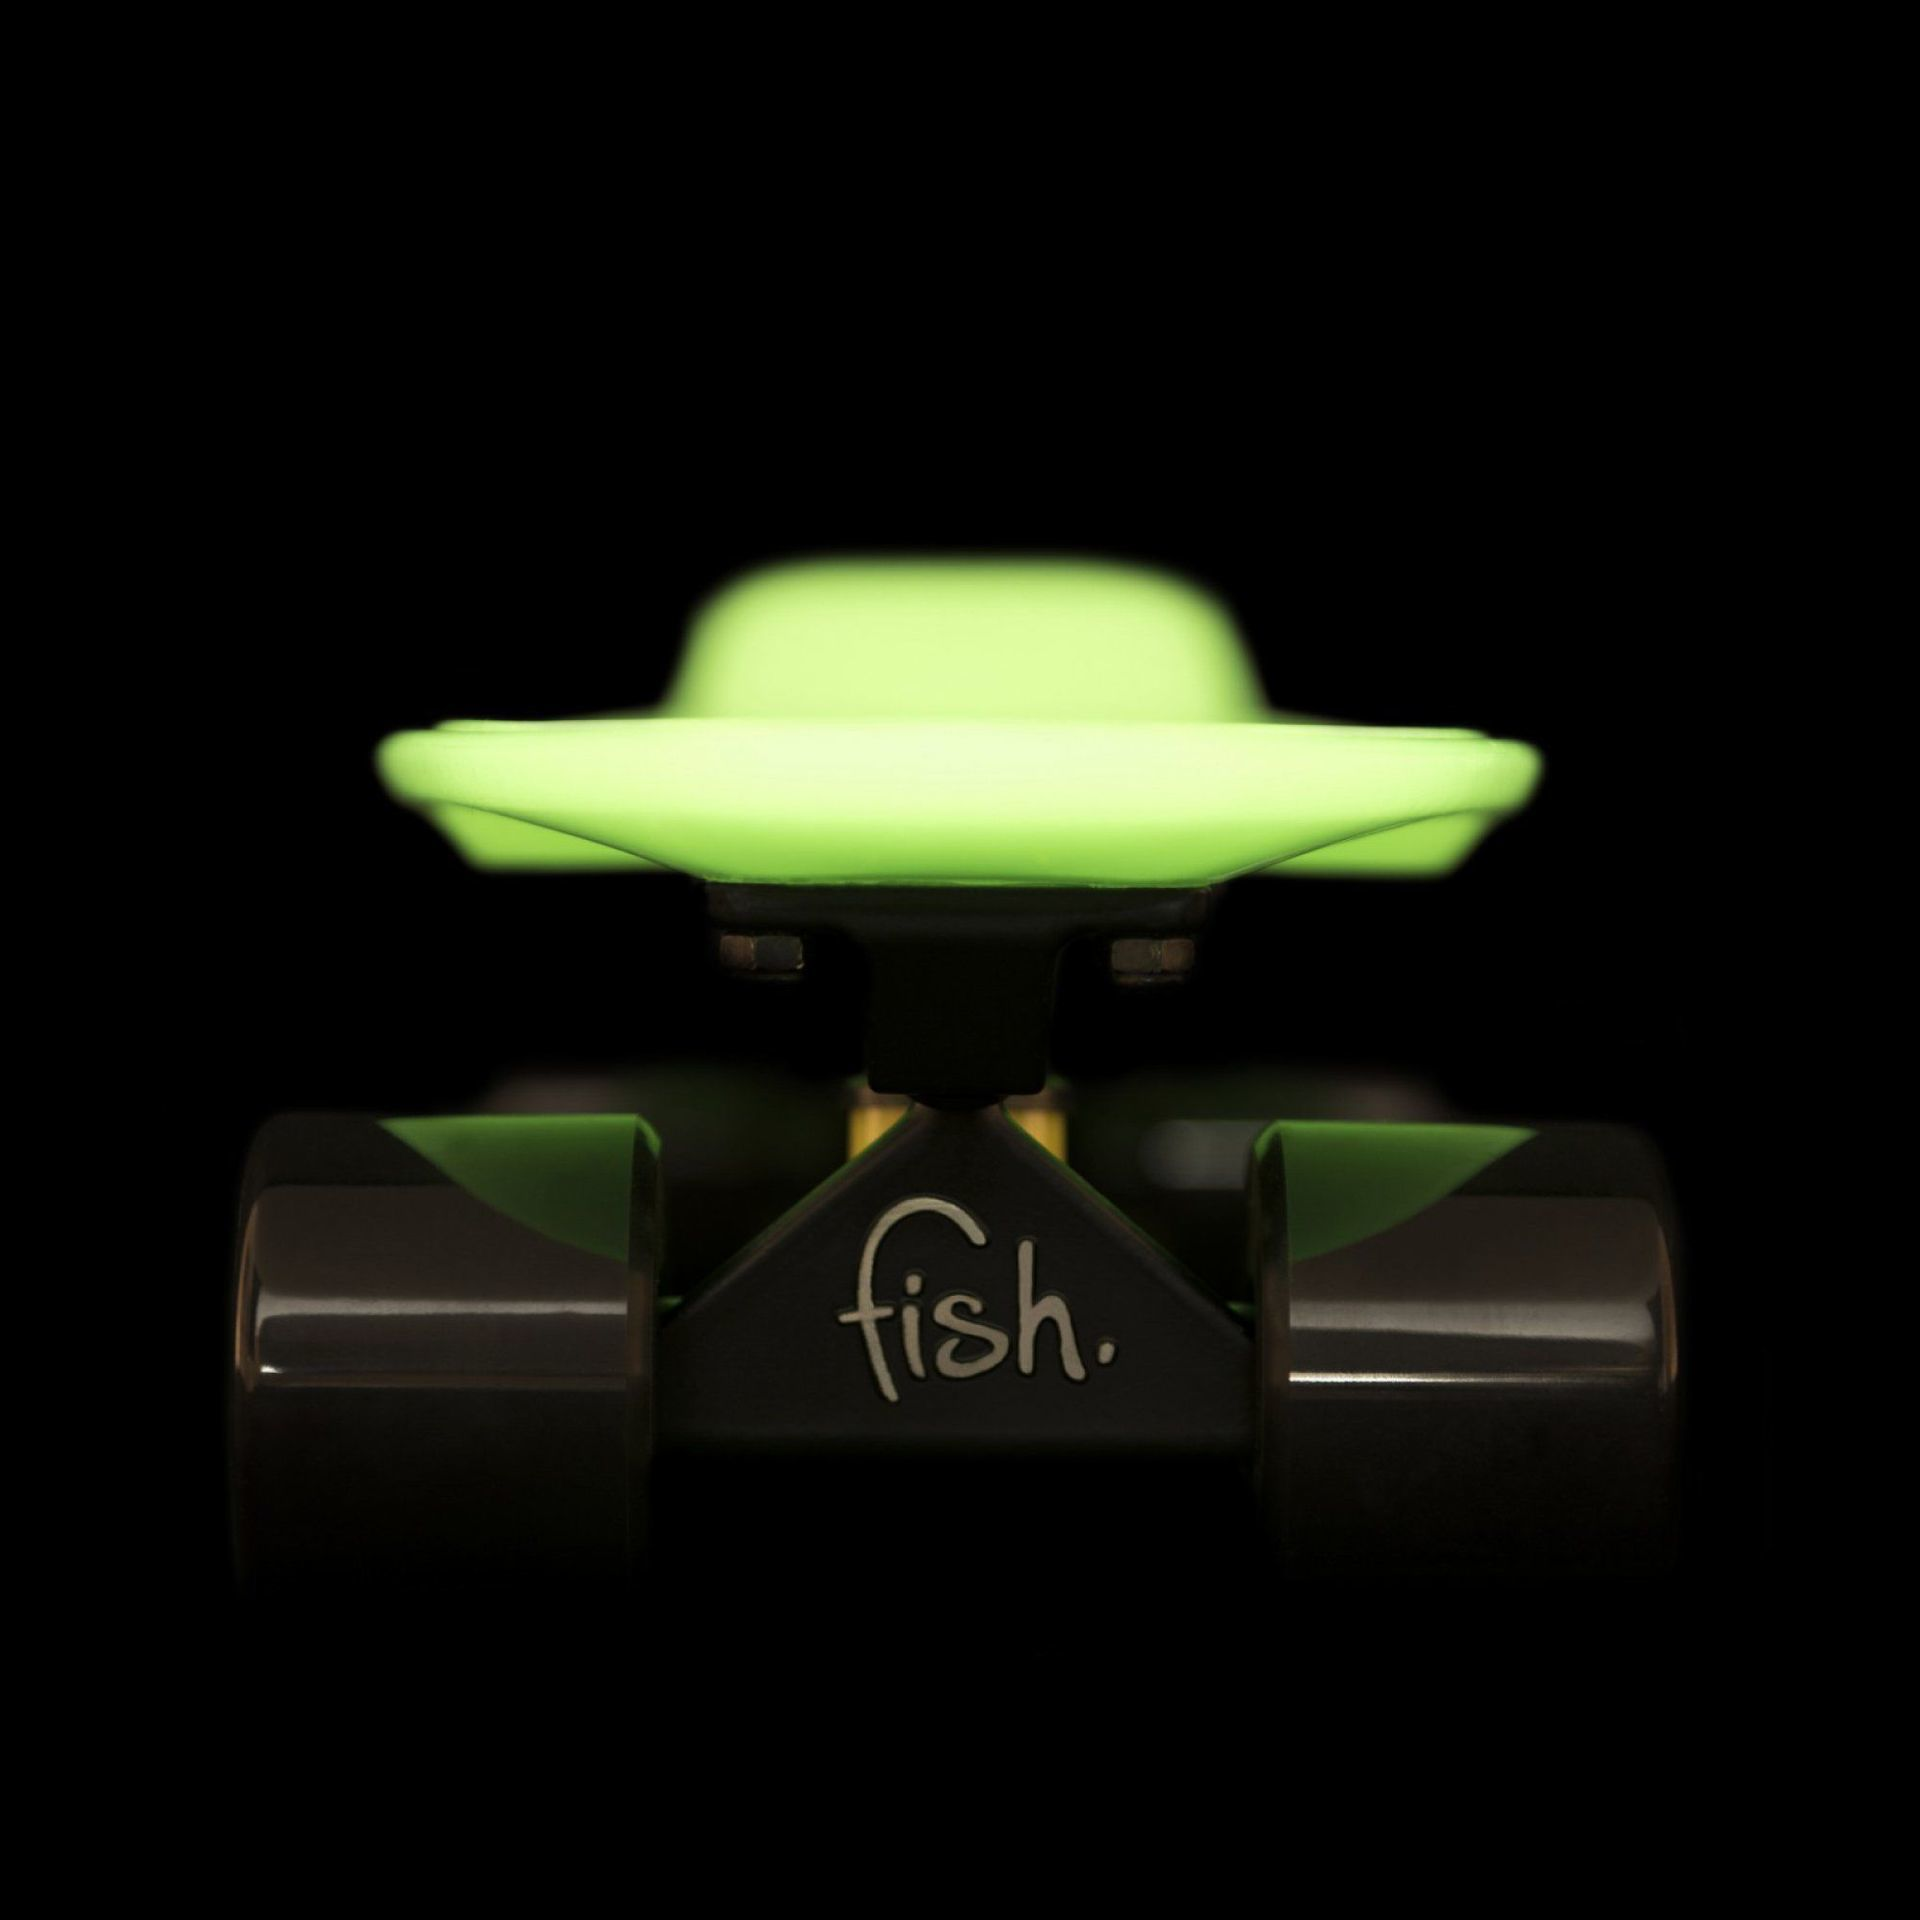 FISHBOARD FISH SKATEBOARDS CLASSIC GLOW GREEN|BLACK 4